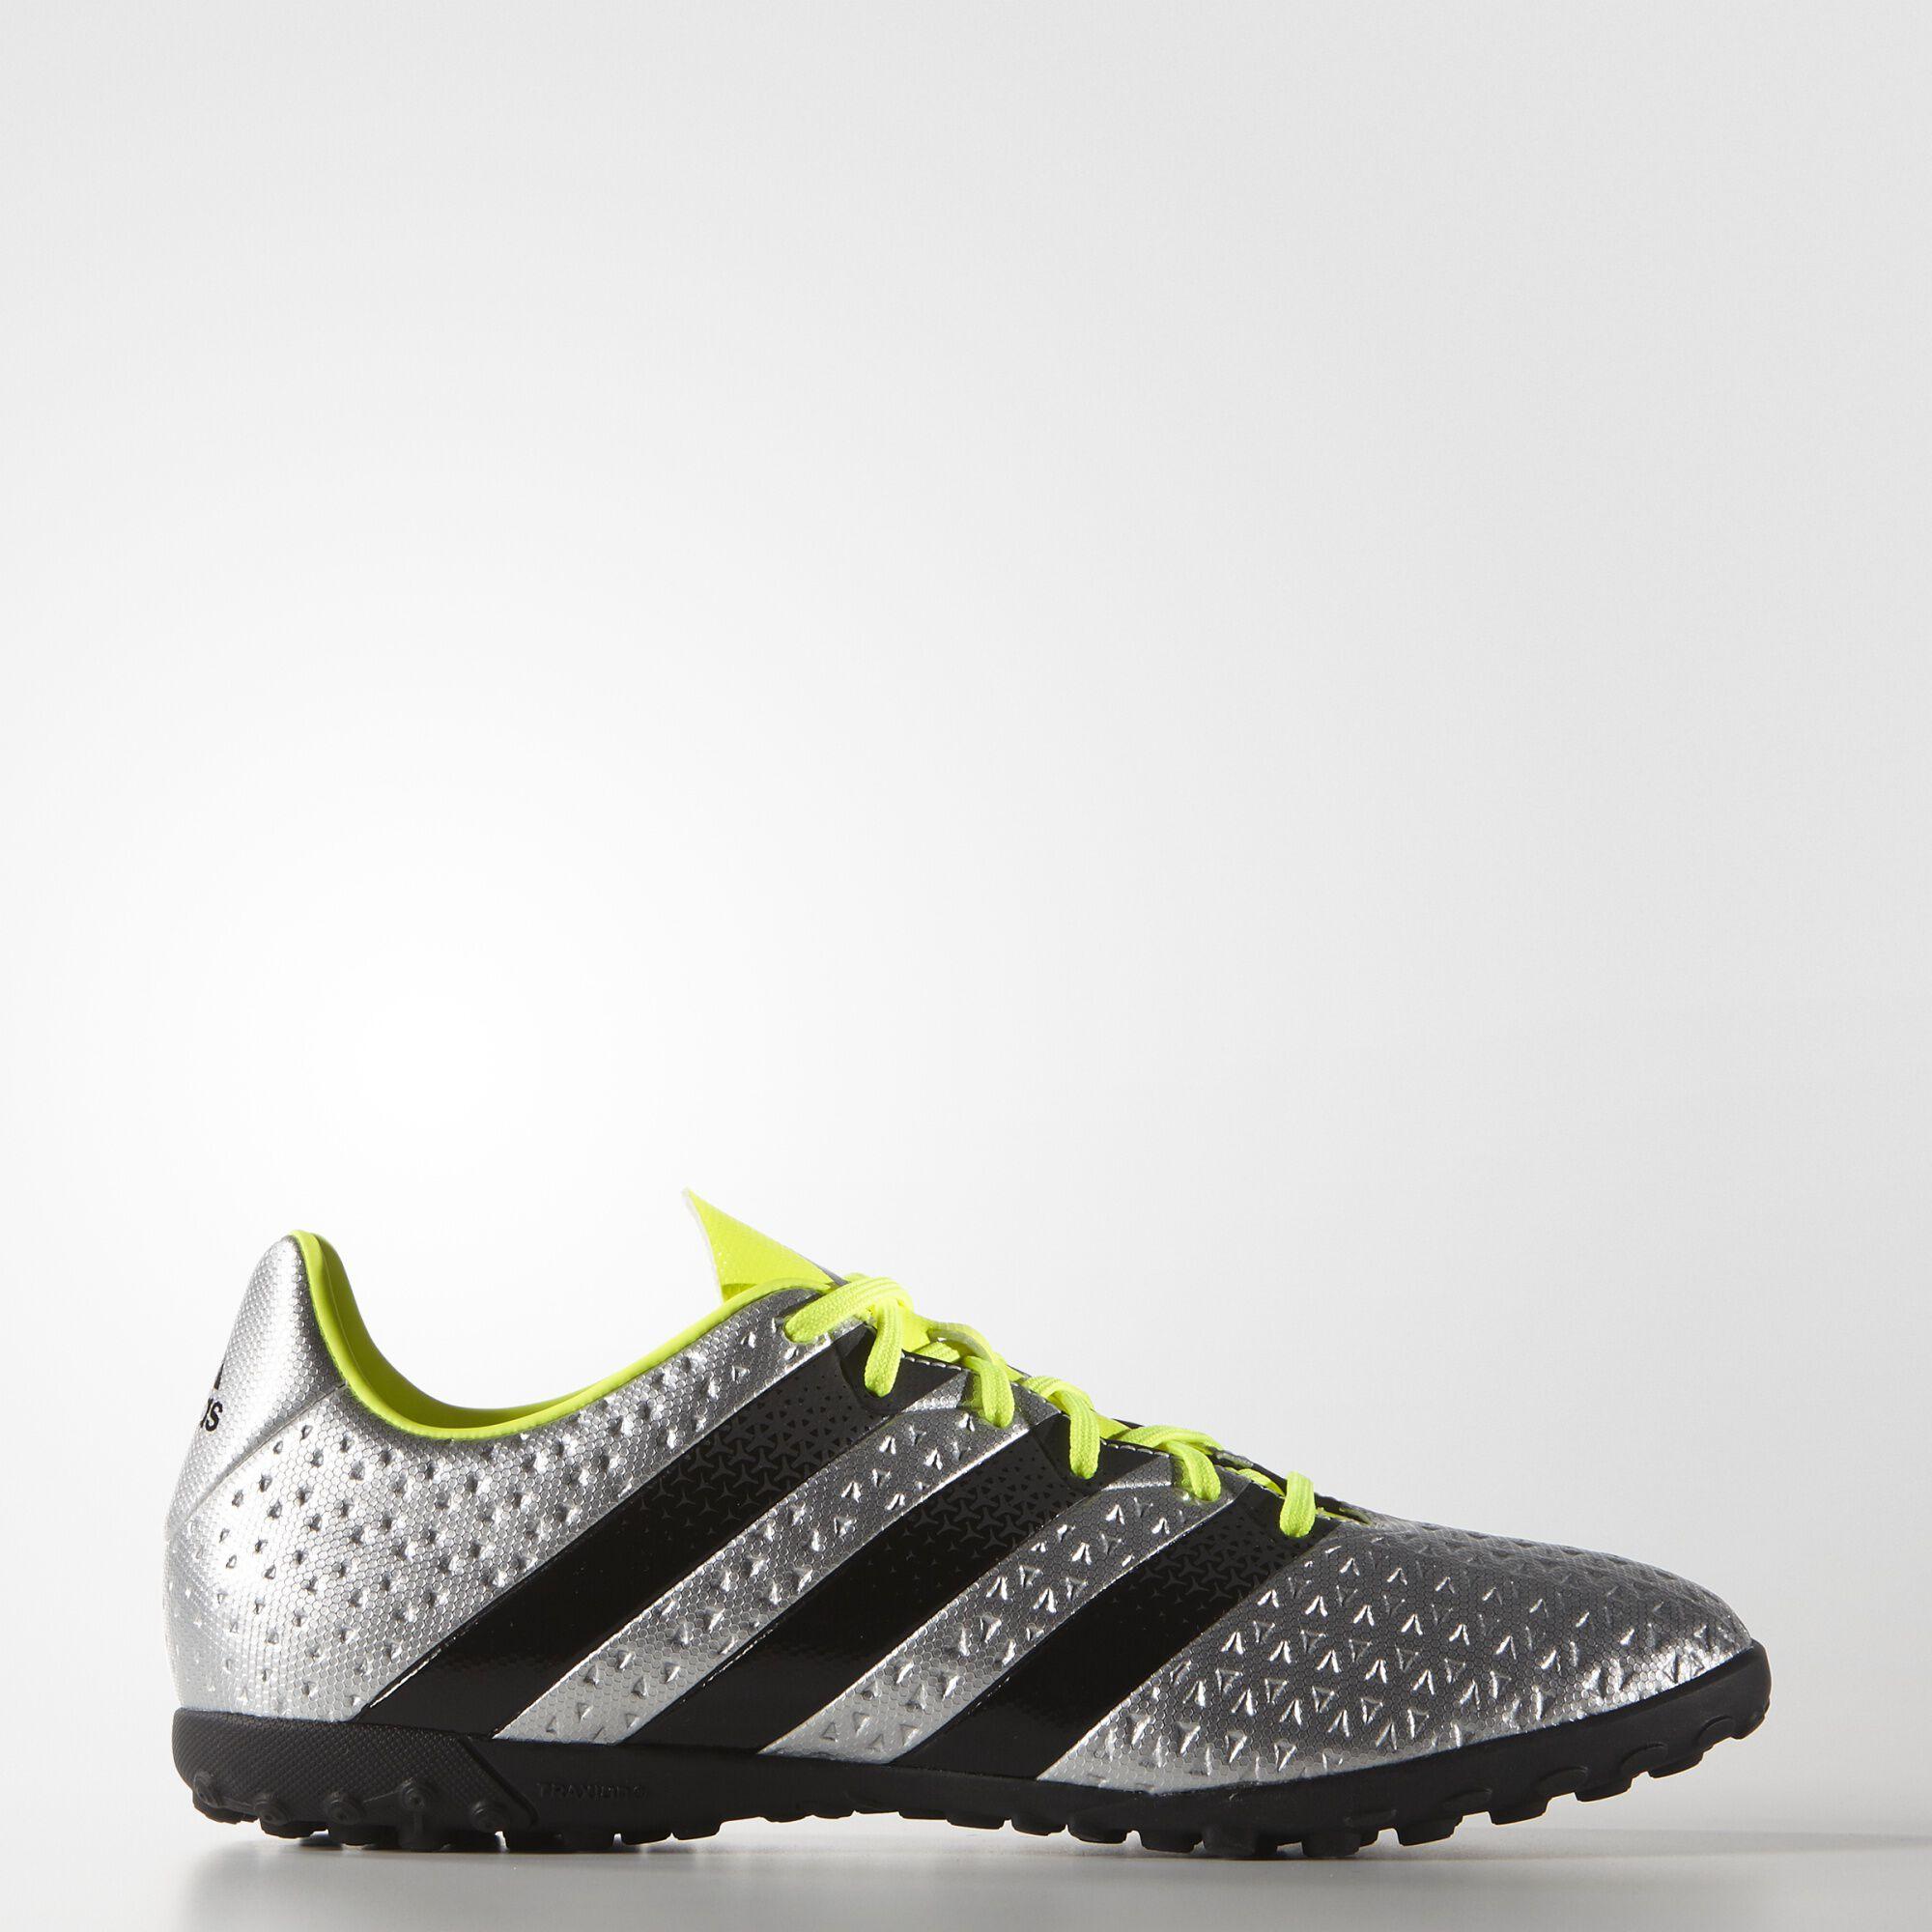 Adidas Ace 16 Futbol Rapido